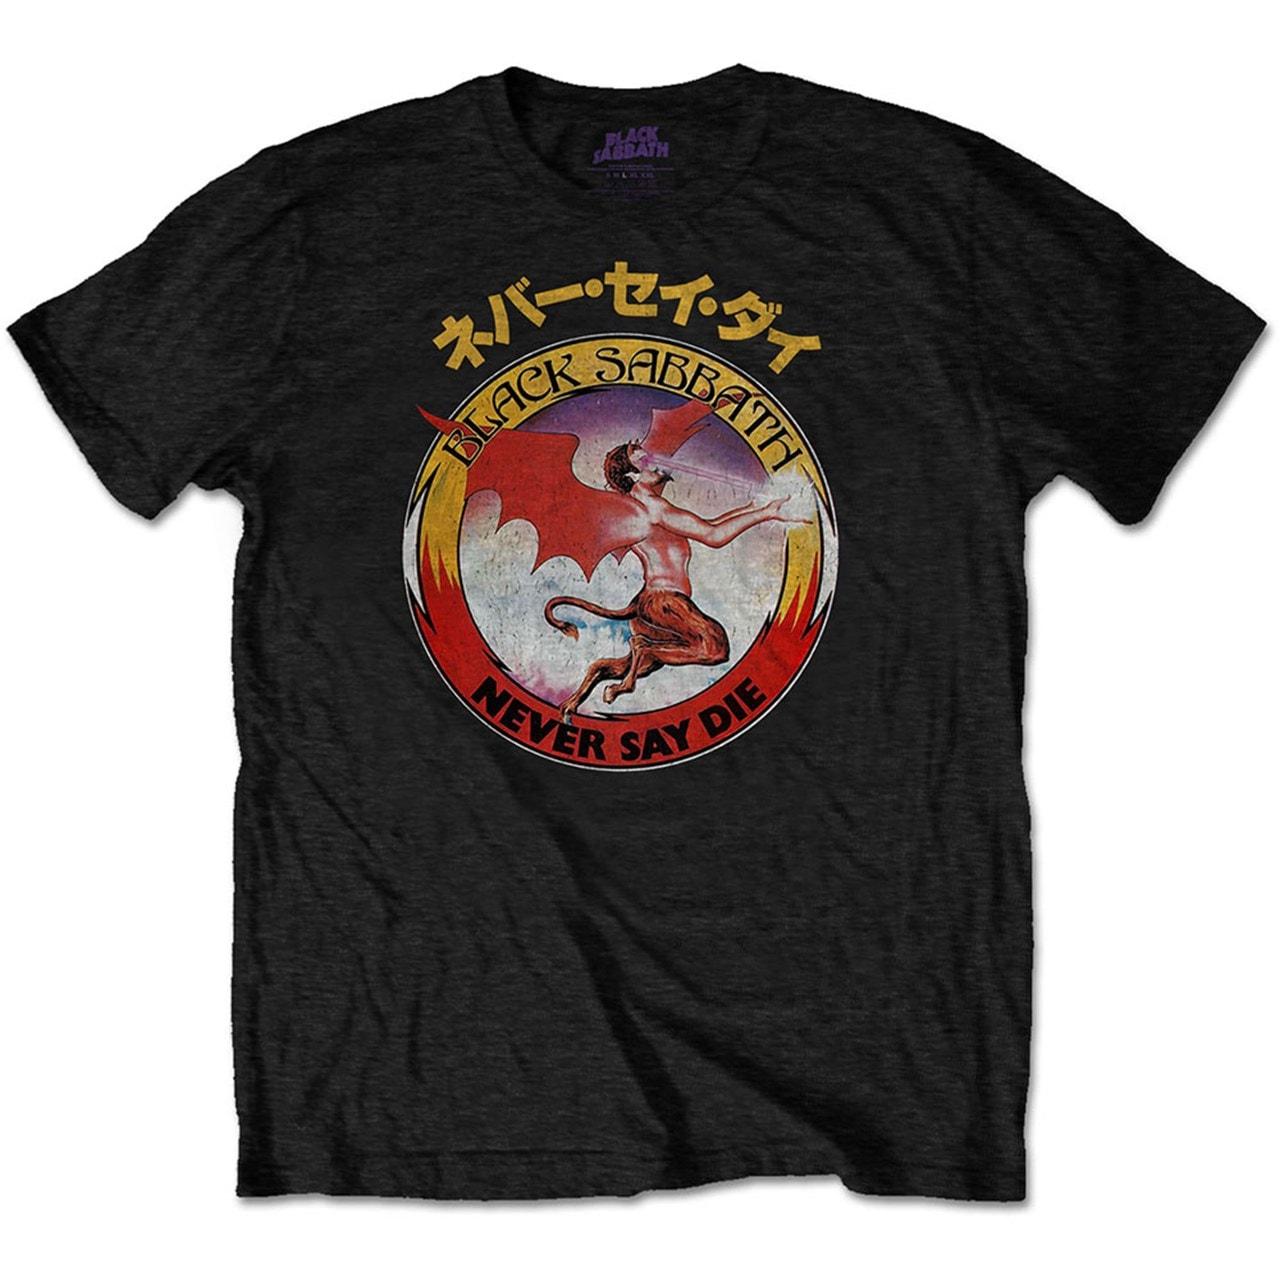 Black Sabbath Reversed Logo (hmv Exclusive) (Small) - 1